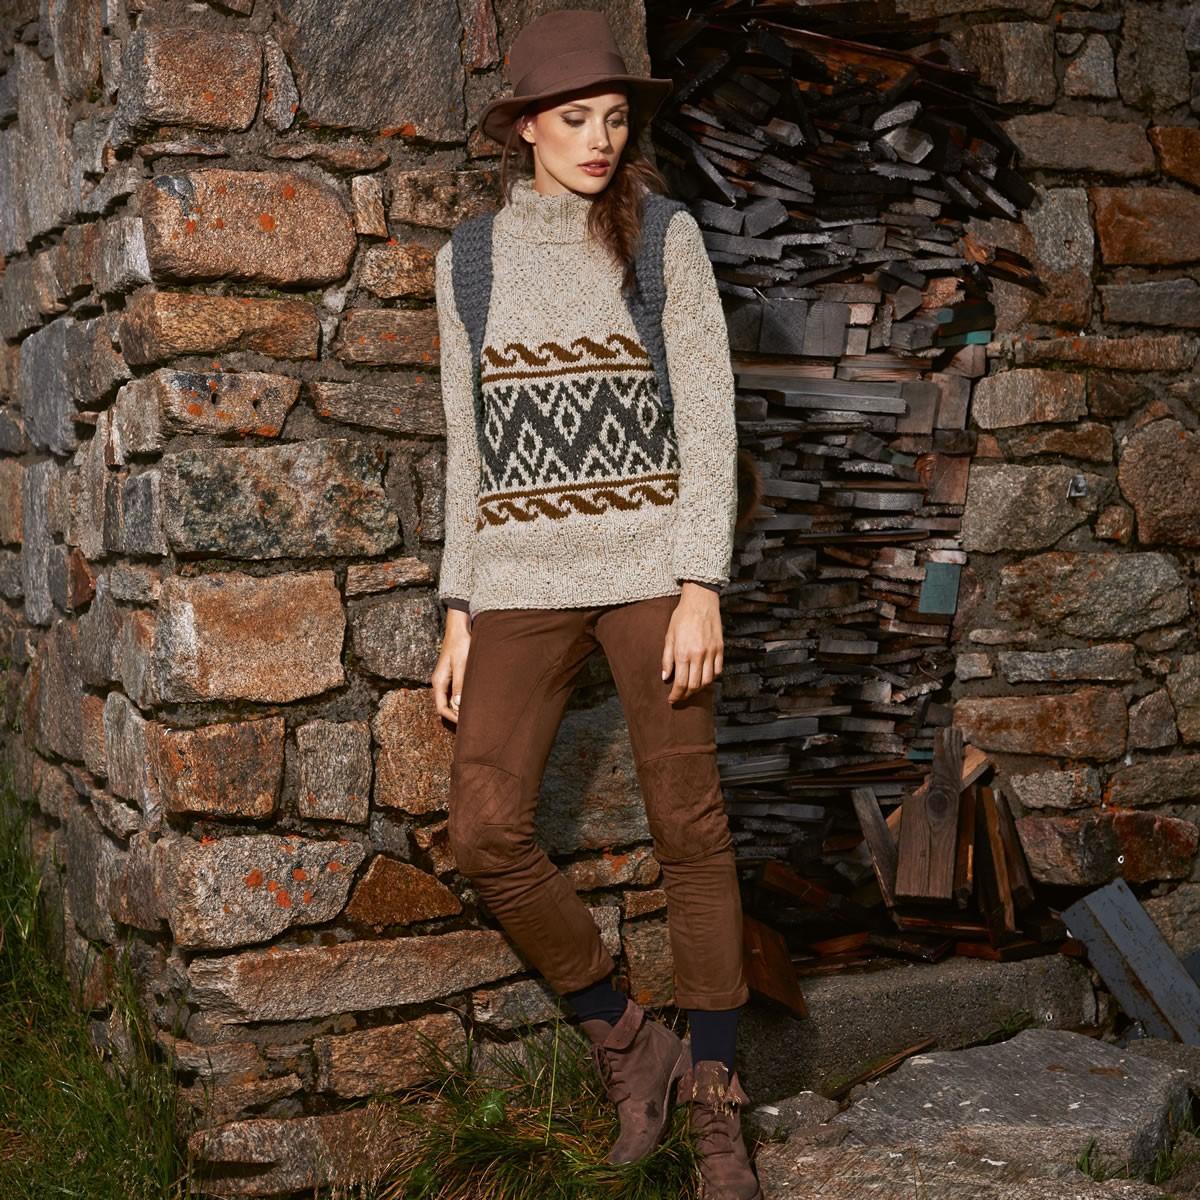 Lana Grossa Пуловер с зигзагами из жемчужного узорa Royal Tweed